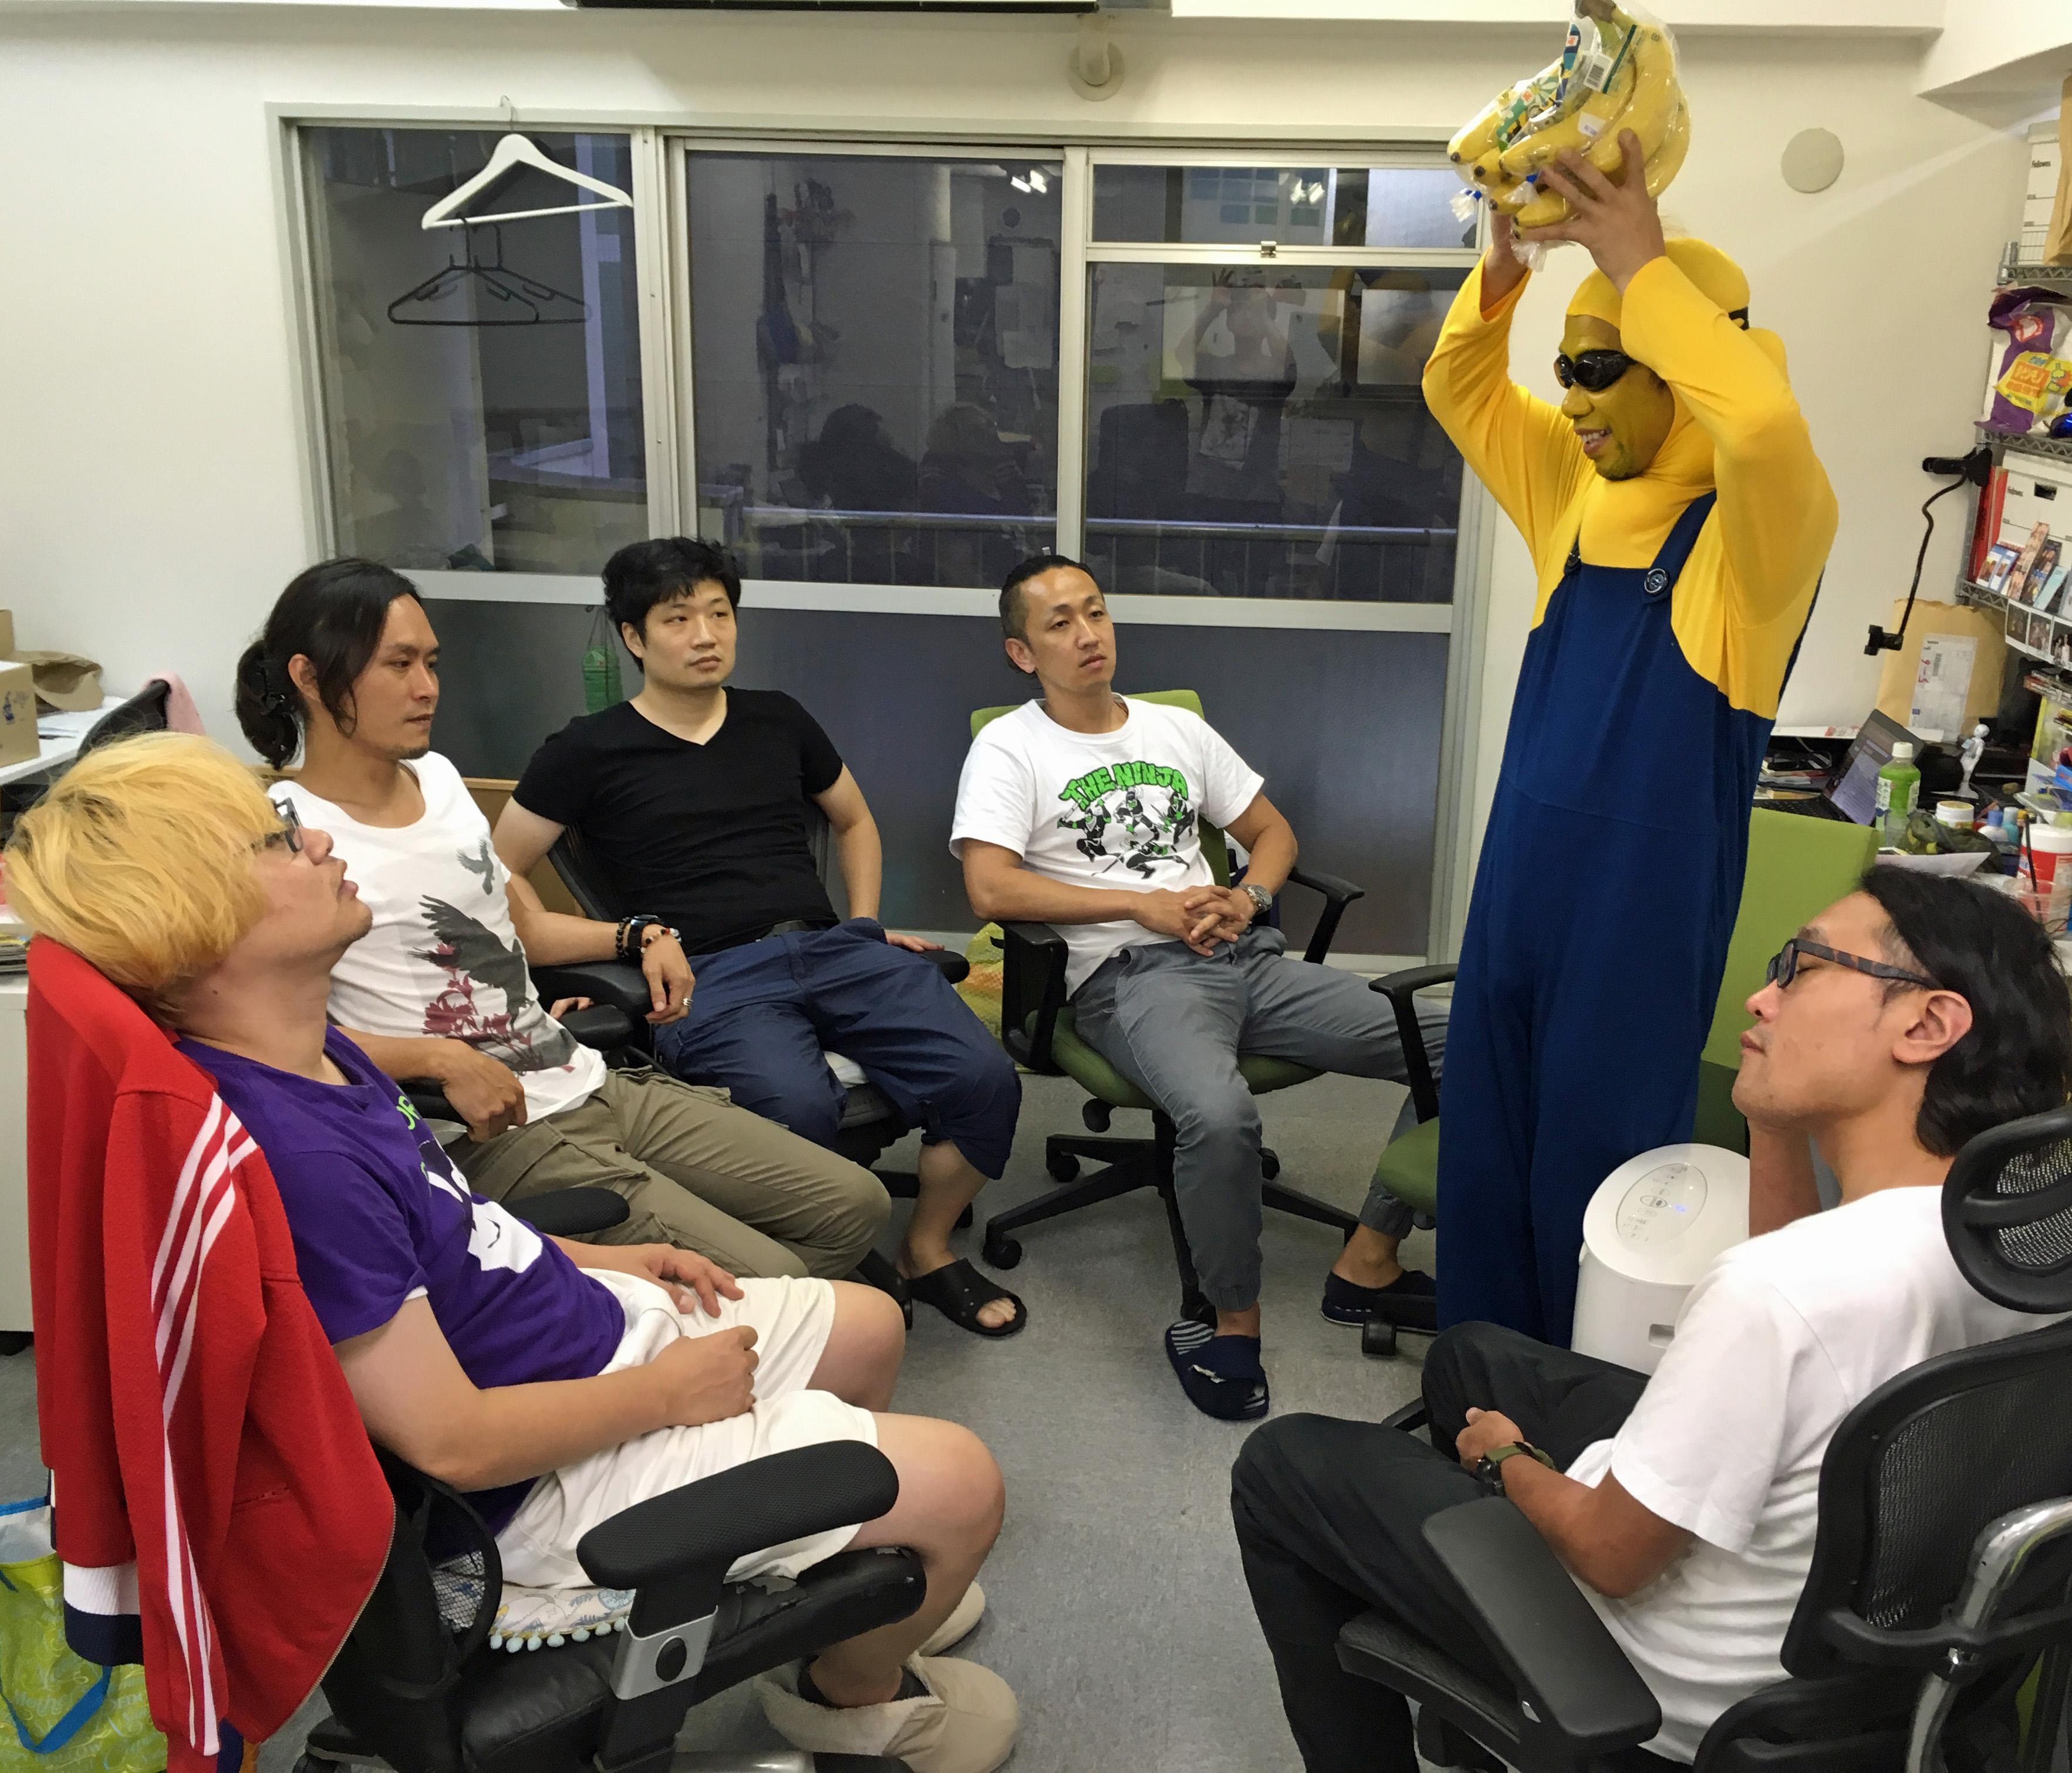 bananam23